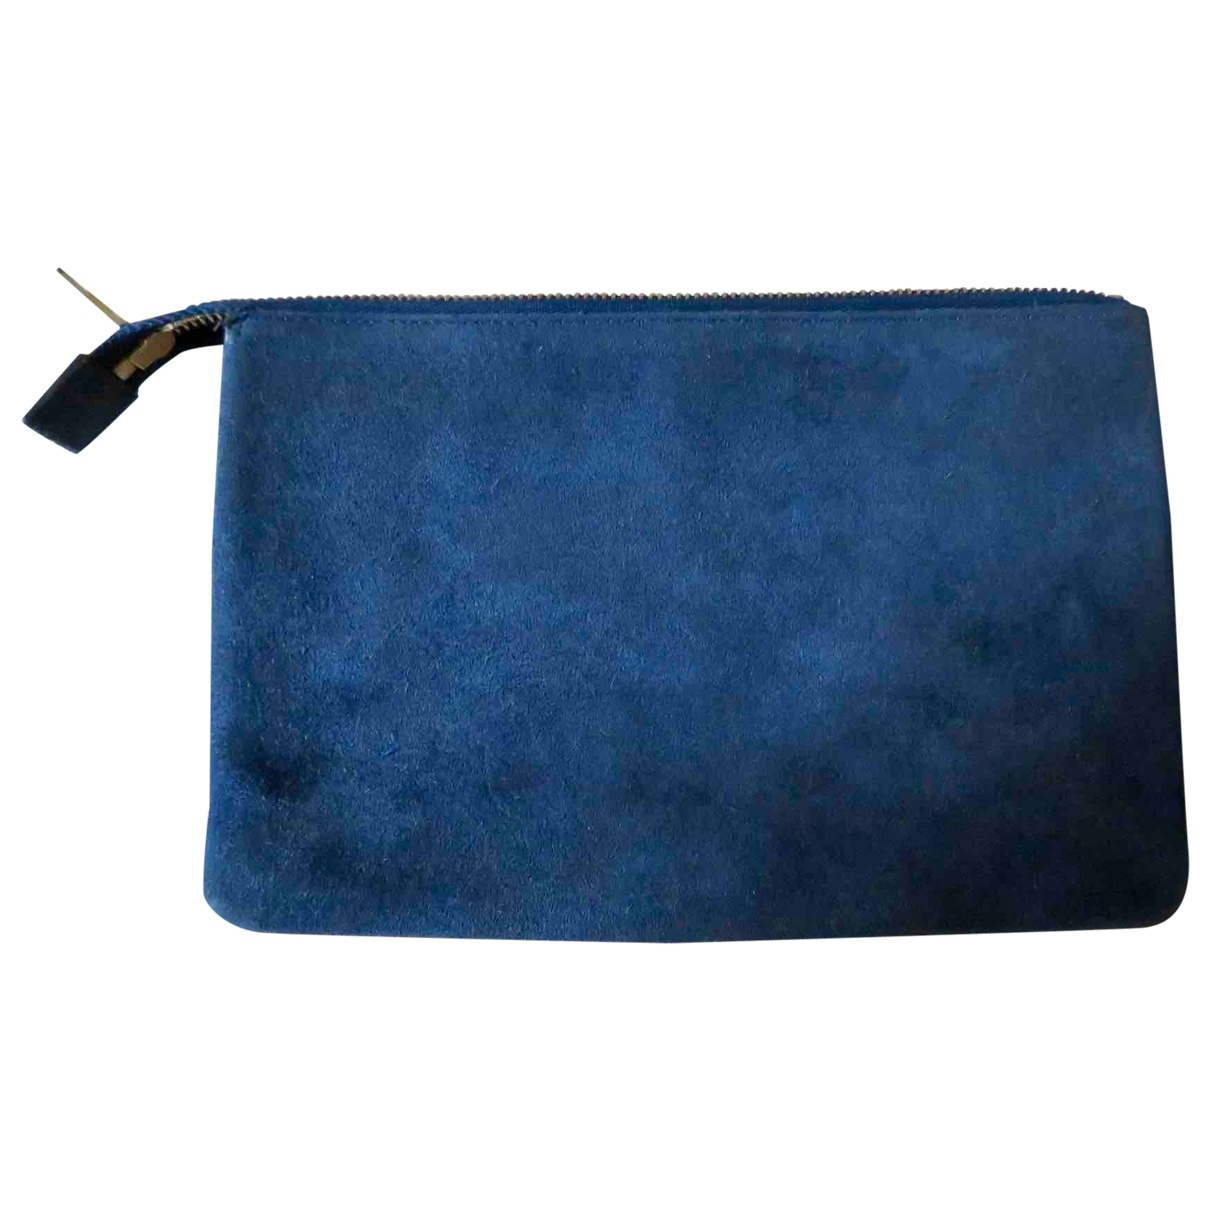 Bolsos clutch en Ante Azul Celine